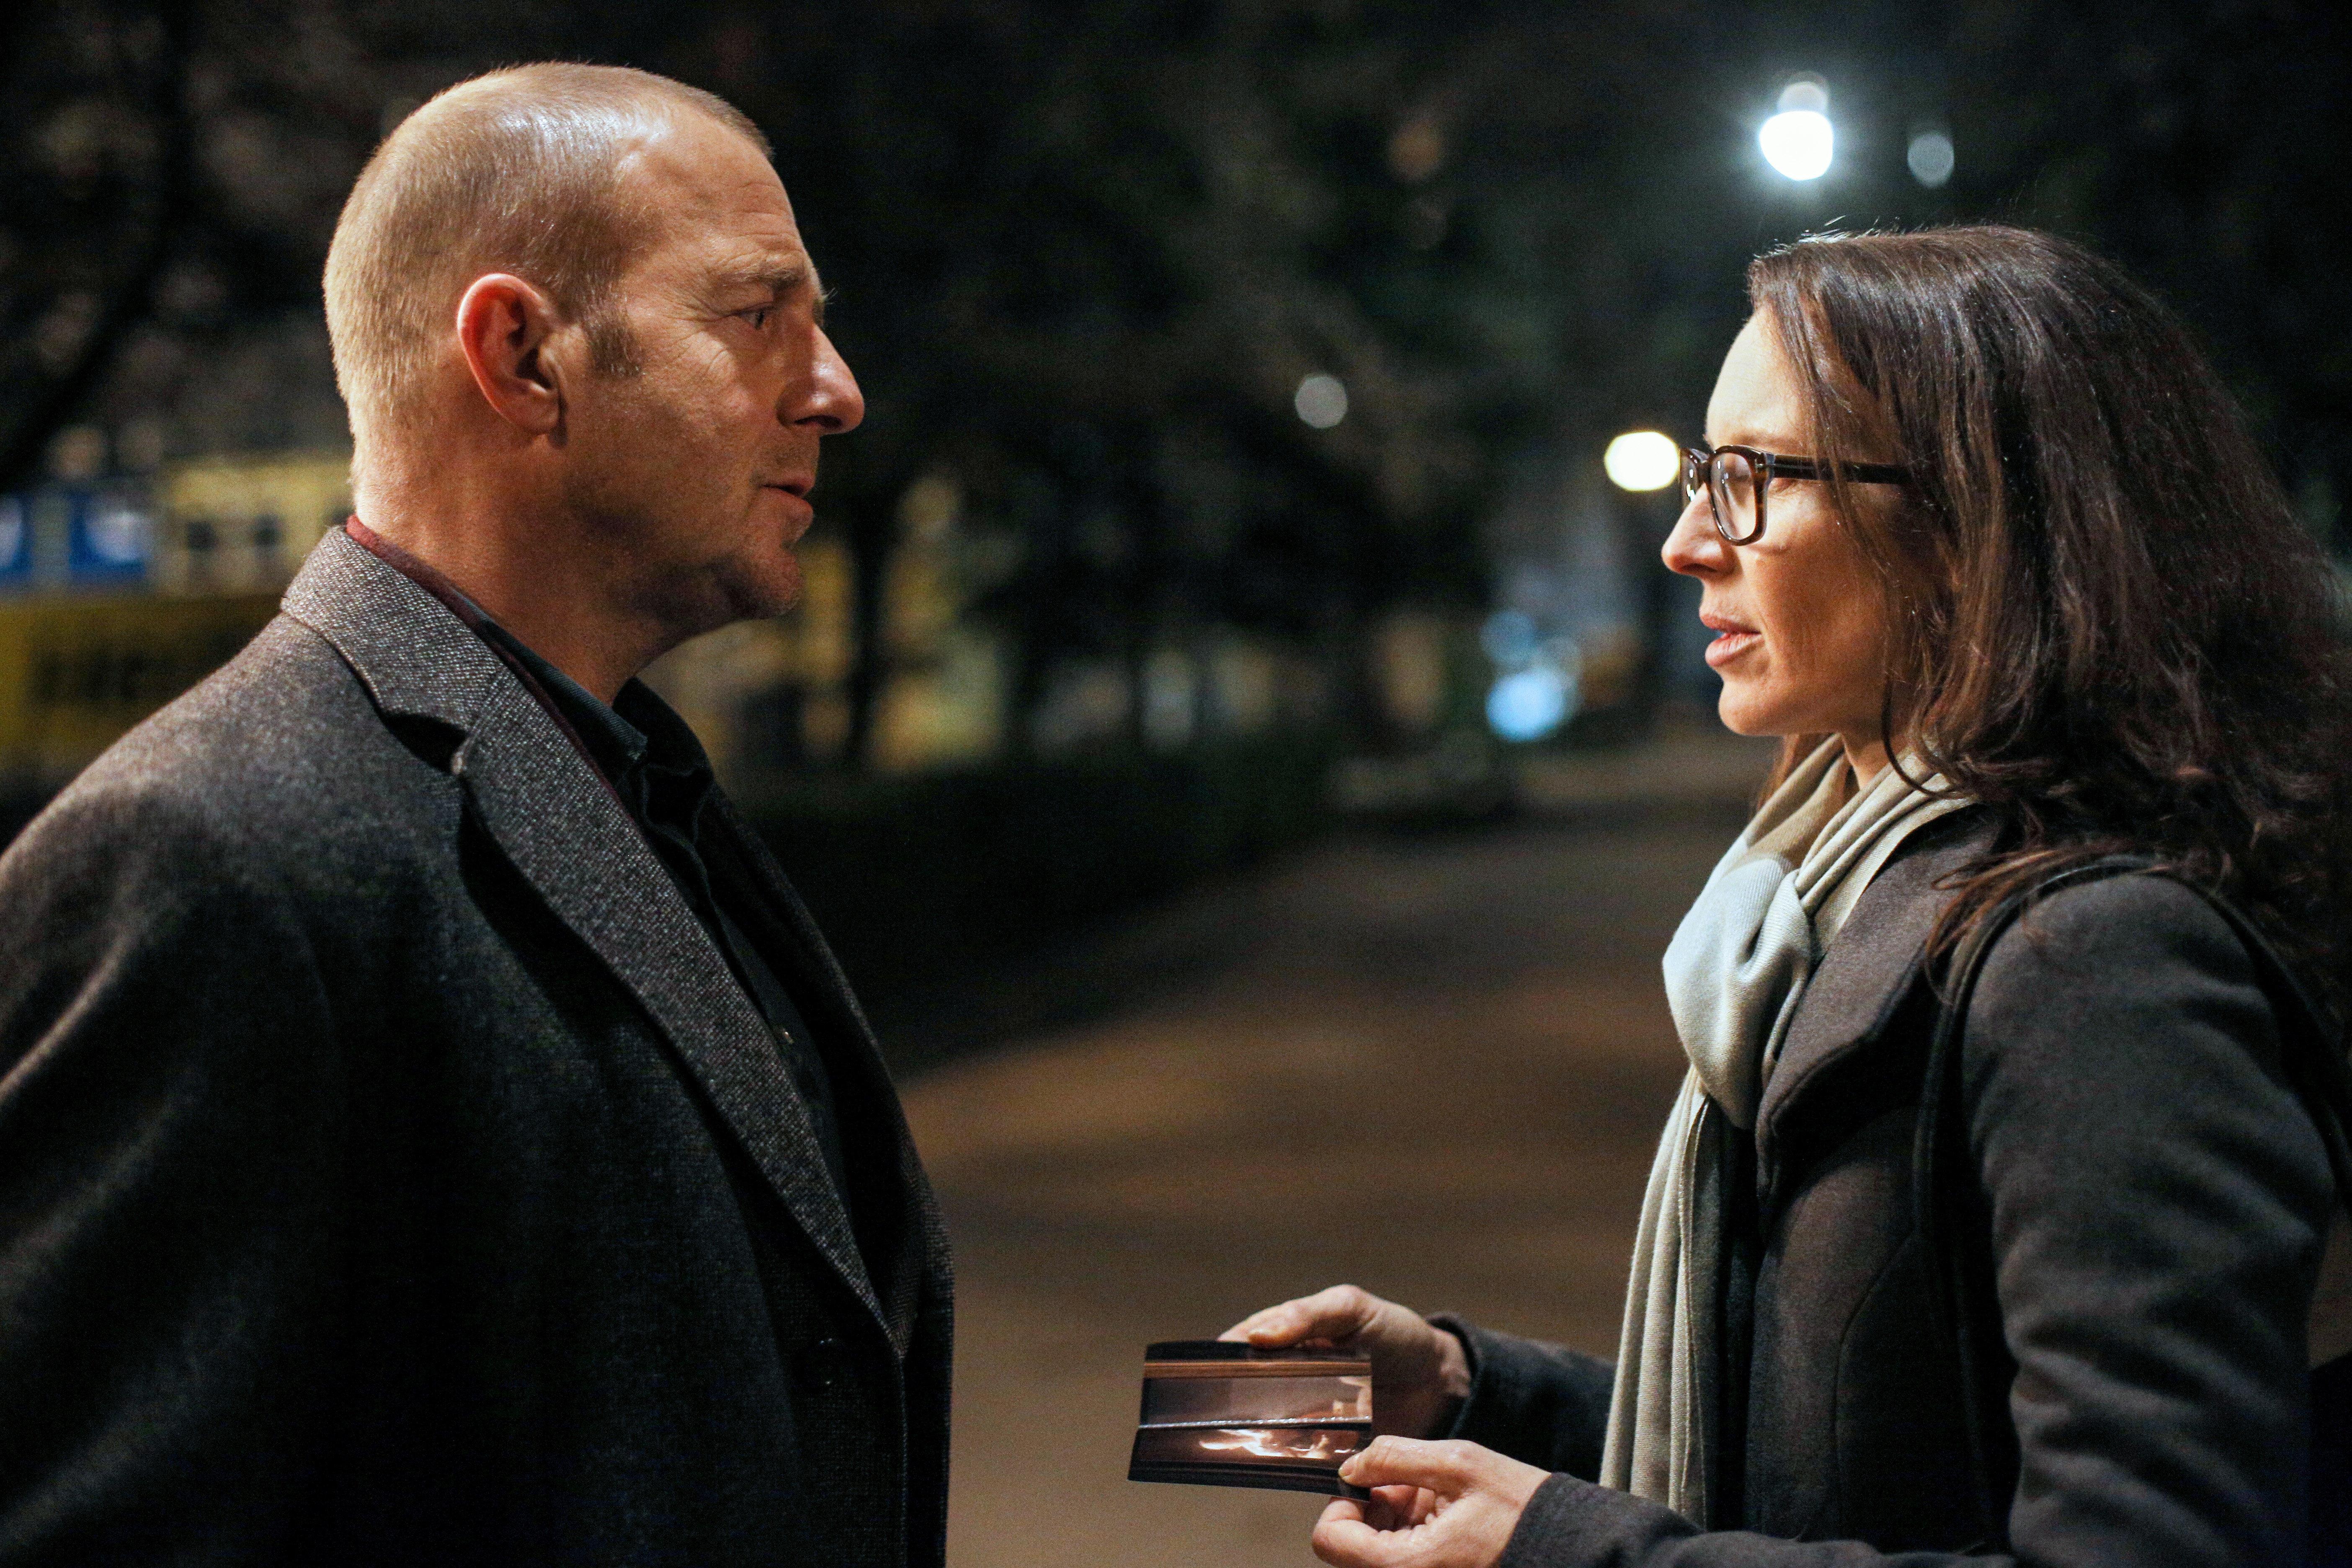 Spuren Des Bösen Schande Film 2014 Trailer Kritik Kinode